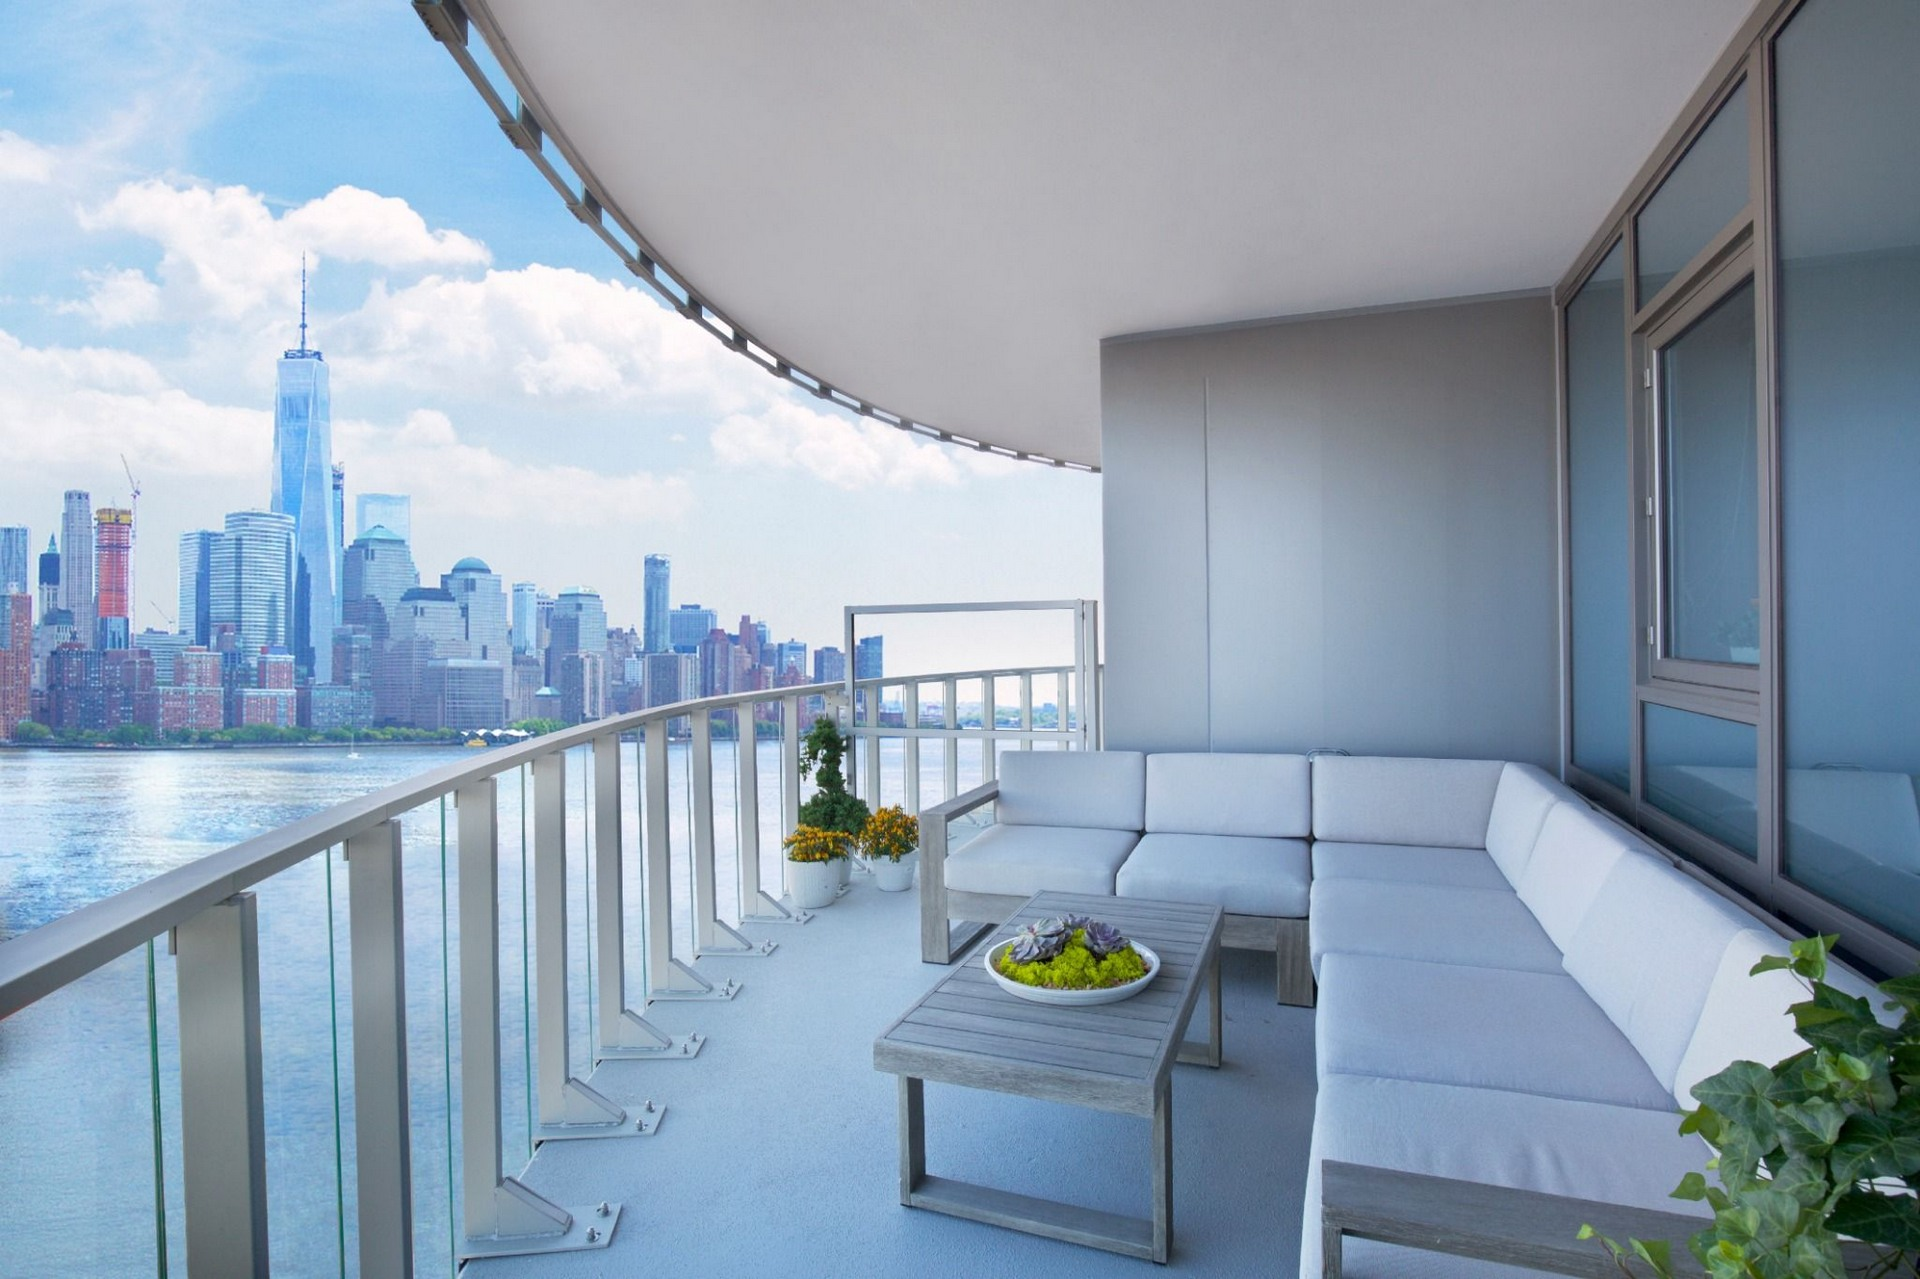 condominium jersey city, luxury condos jersey city